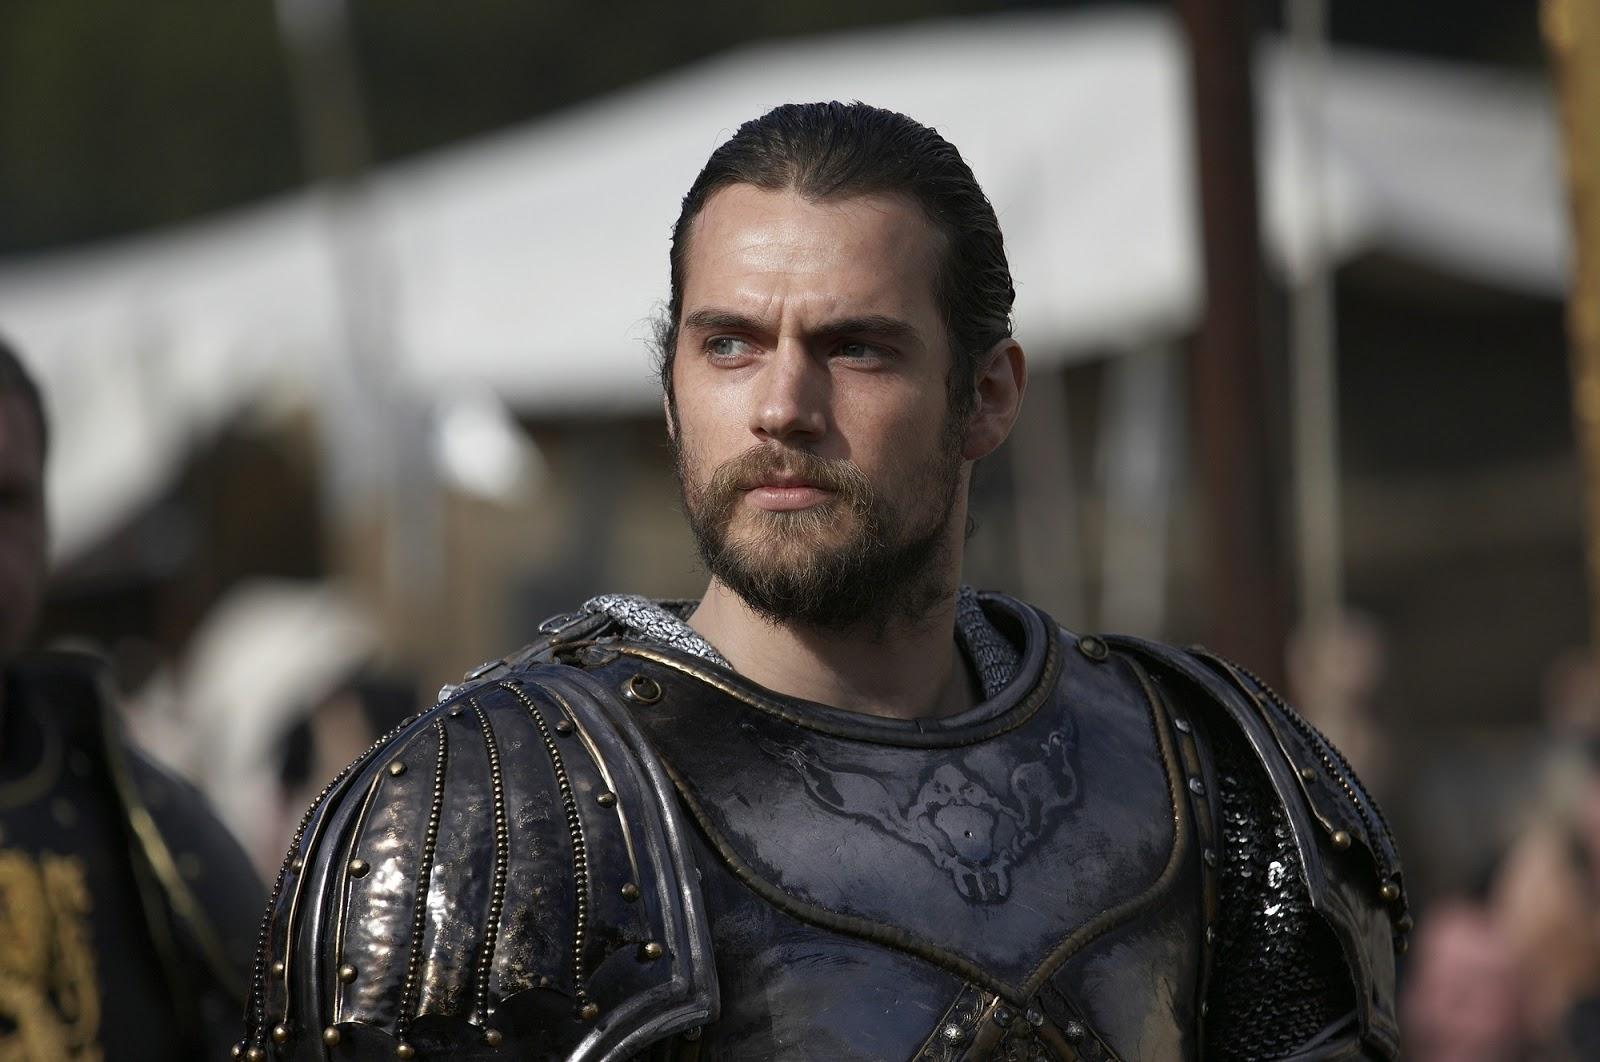 The Wertzone Henry Cavill Cast As Geralt In Netflix U0026 39 S